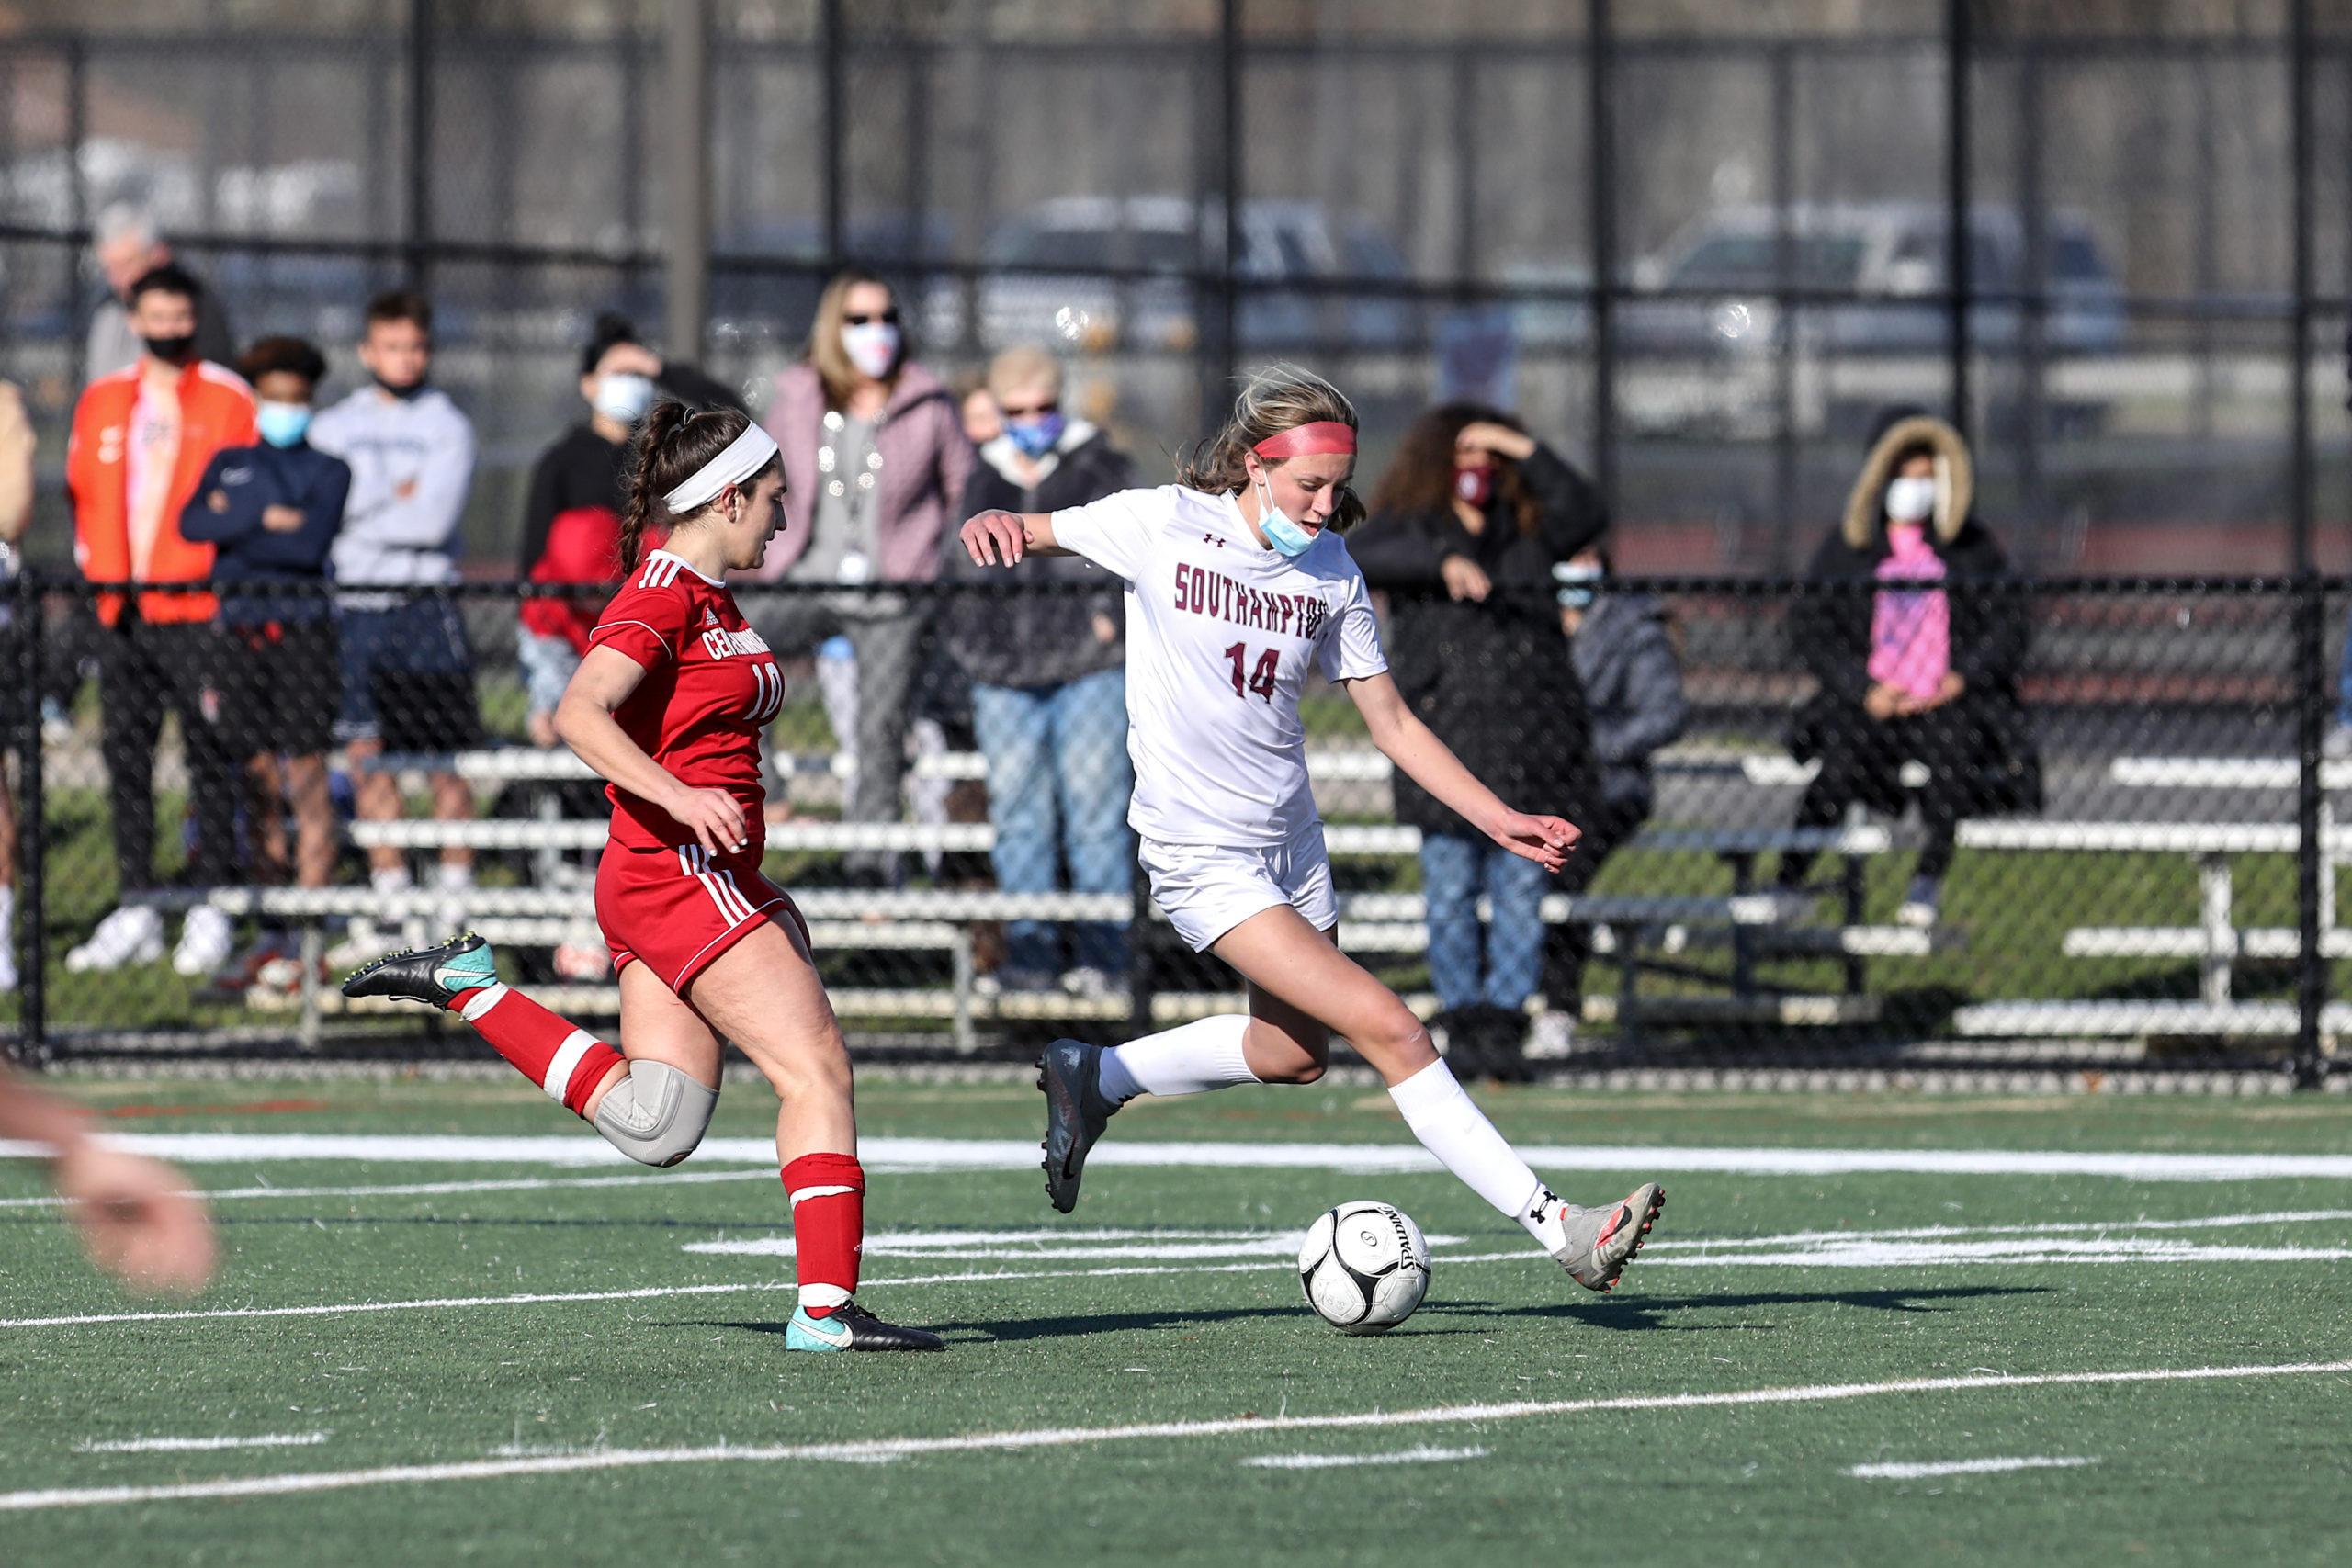 Southampton sophomore Juliette Archer moves the ball.